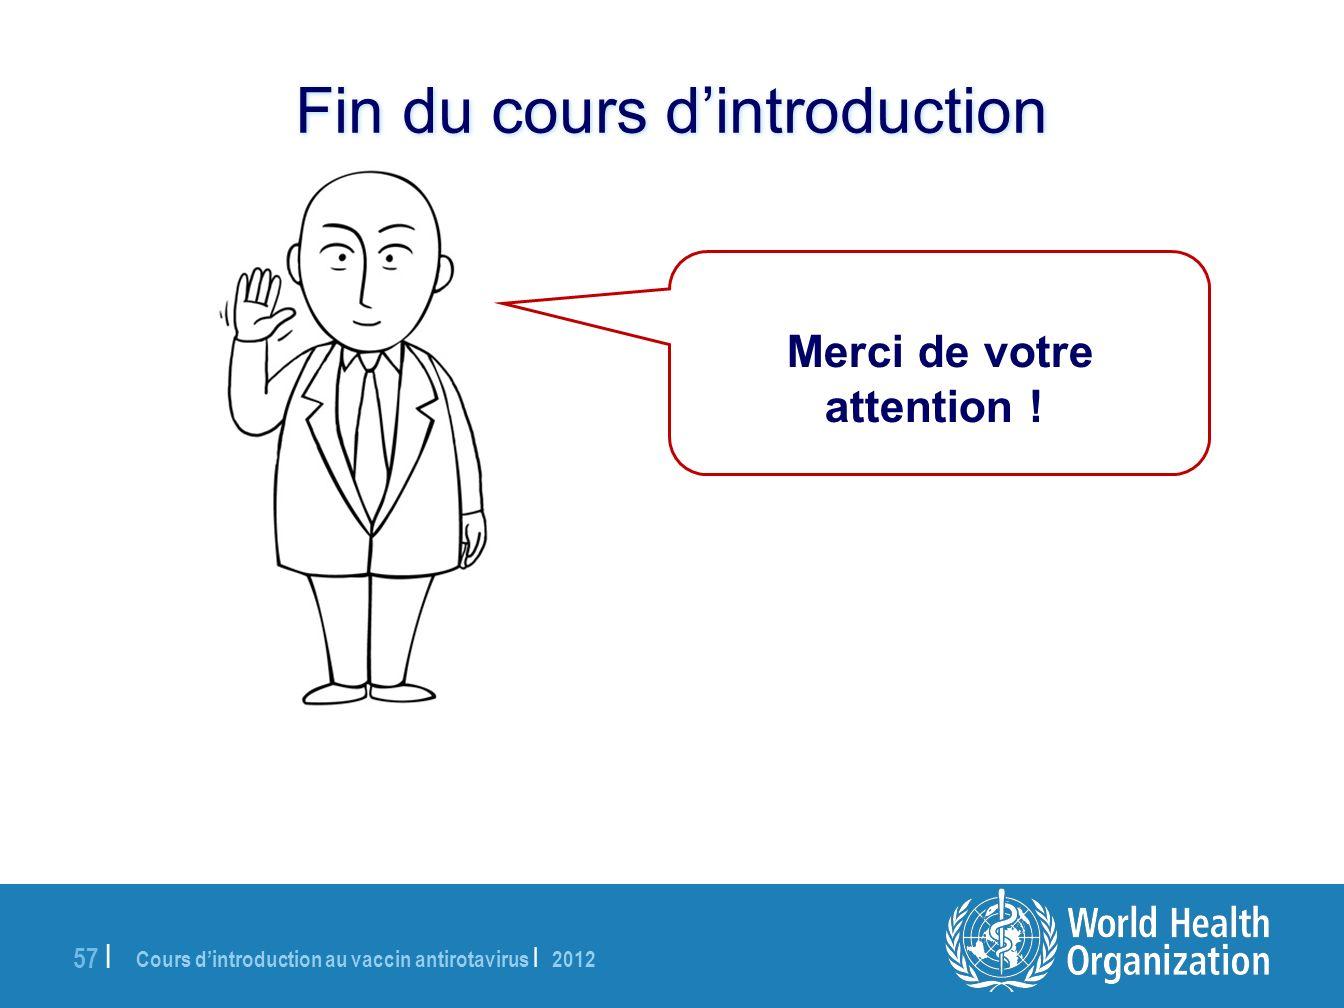 Cours dintroduction au vaccin antirotavirus | 2012 57 | Merci de votre attention ! Fin du cours dintroduction